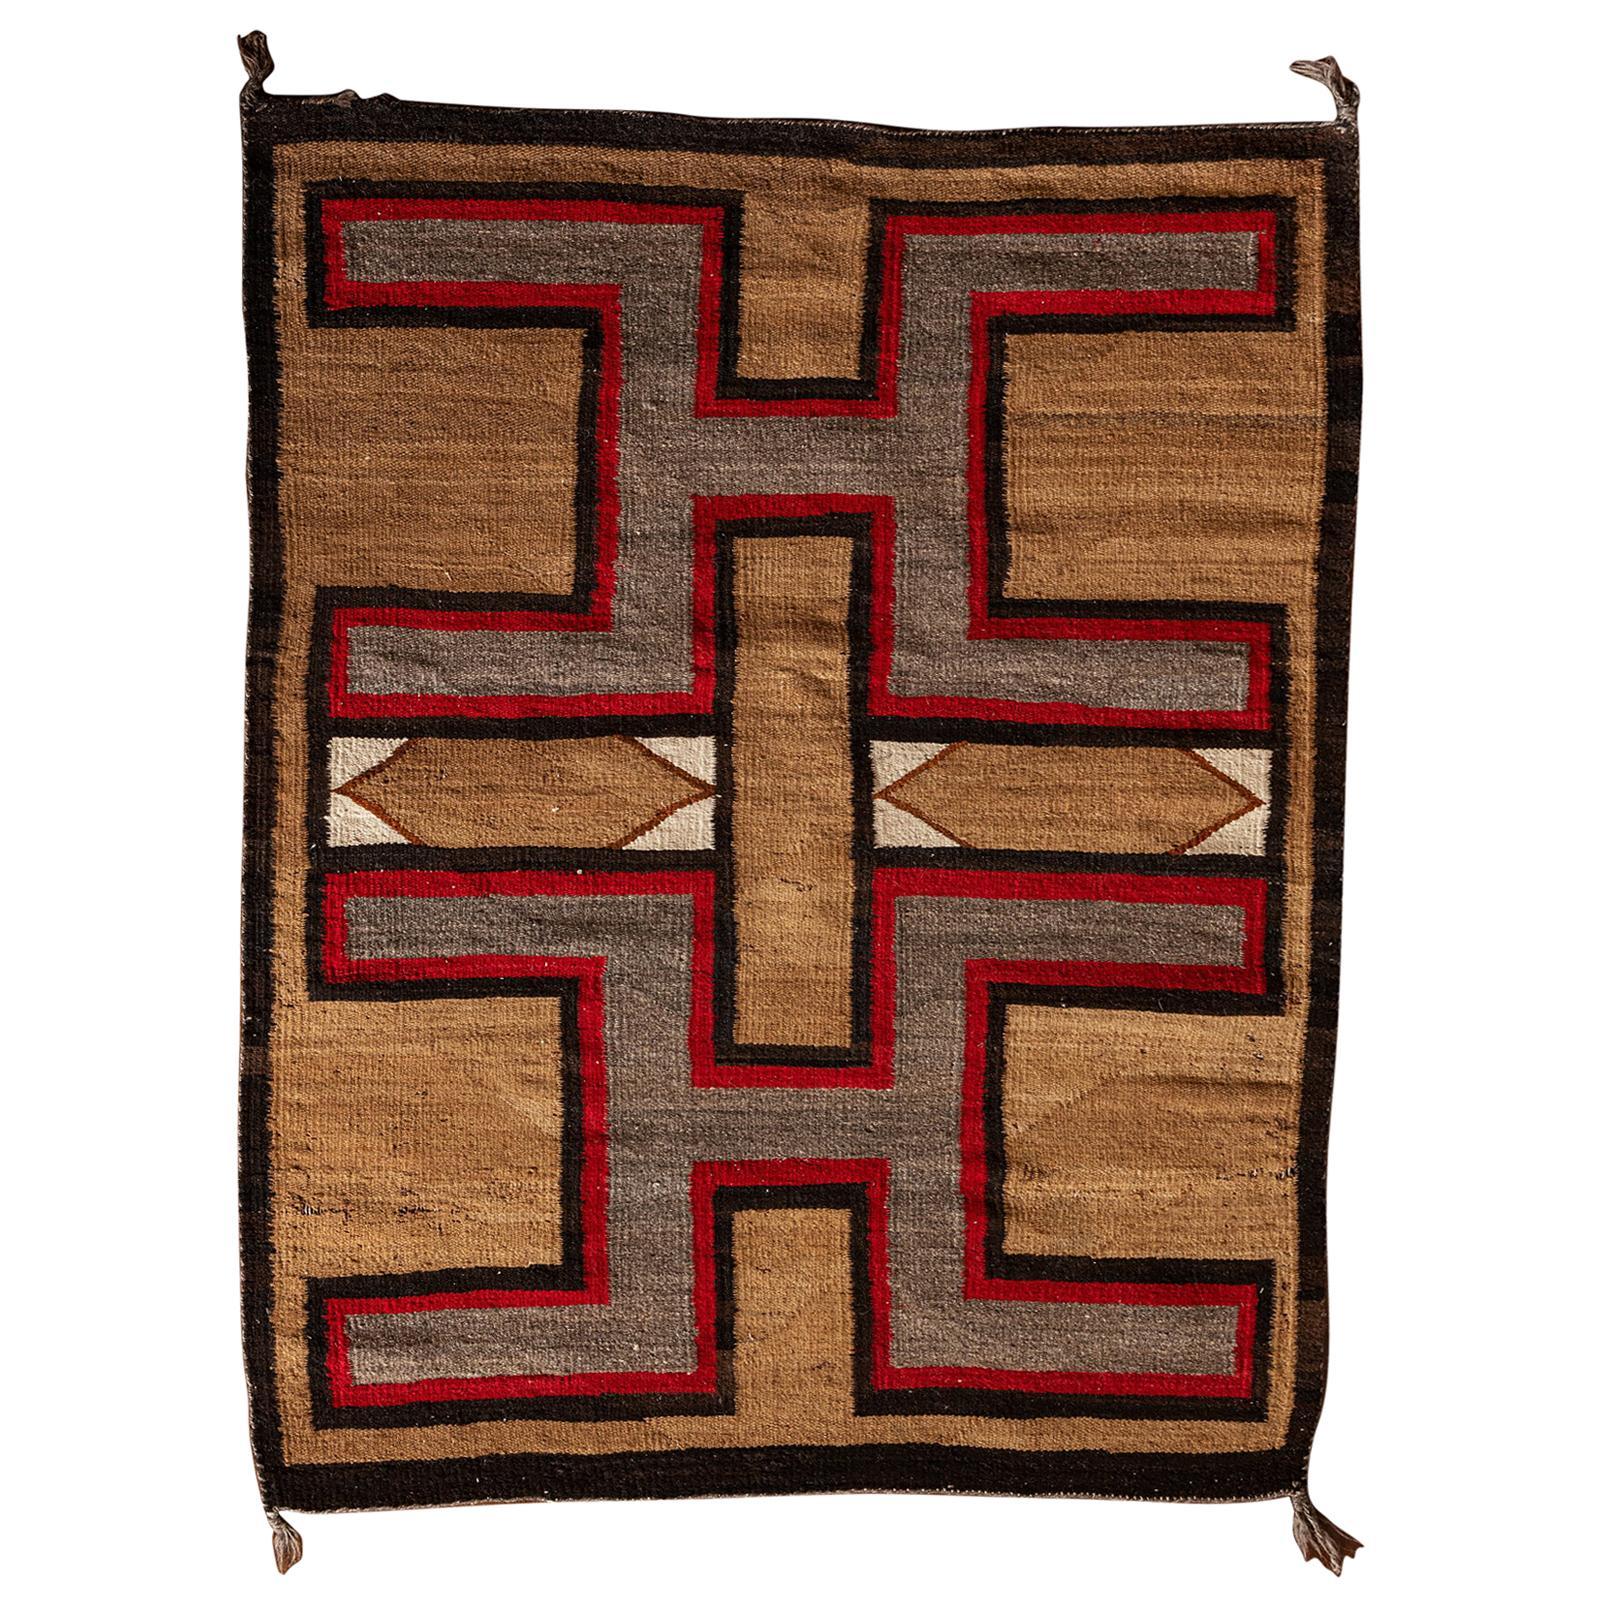 Navajo Regional Textile, 1930s